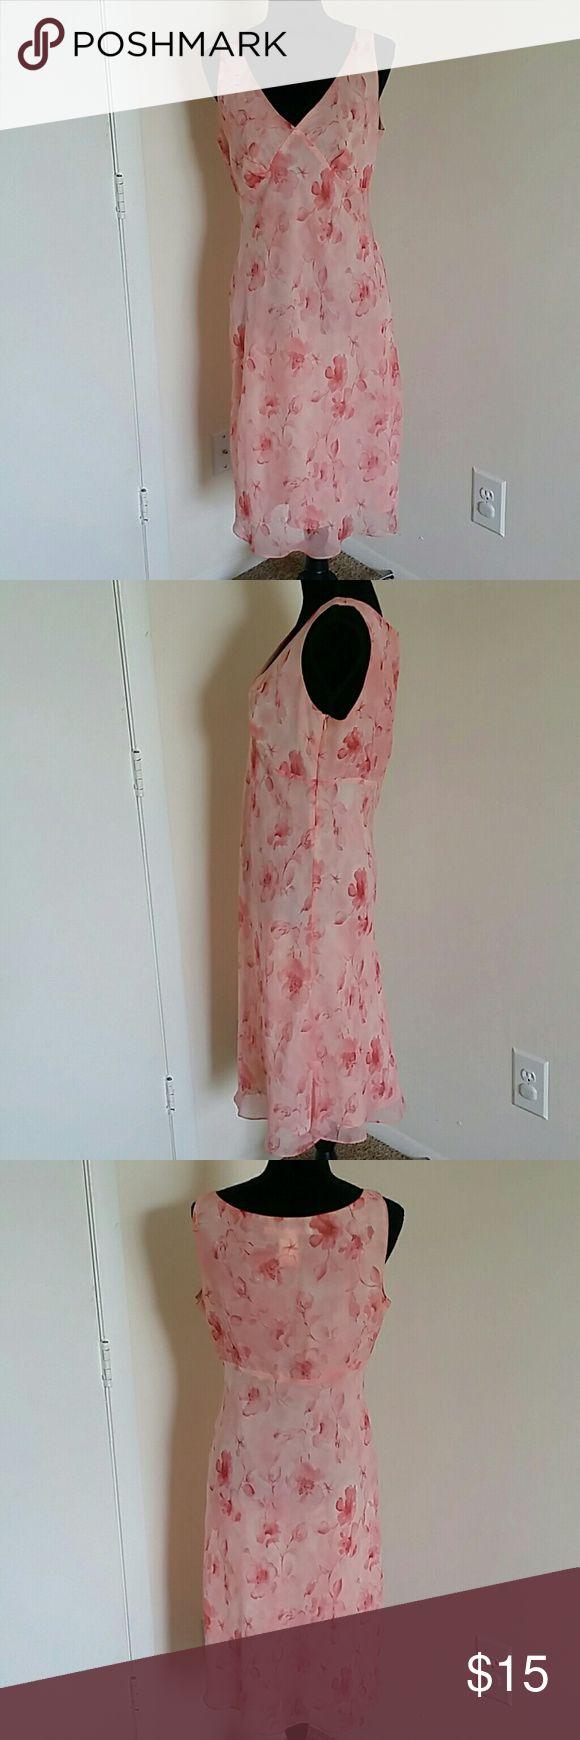 Max Studio Size 12 Sleeveless Pink Chiffon Floral Max Studio Size 12 Sleeveless Pink Chiffon Floral Dress Fully Lined Knee Length Max Studio Dresses Midi